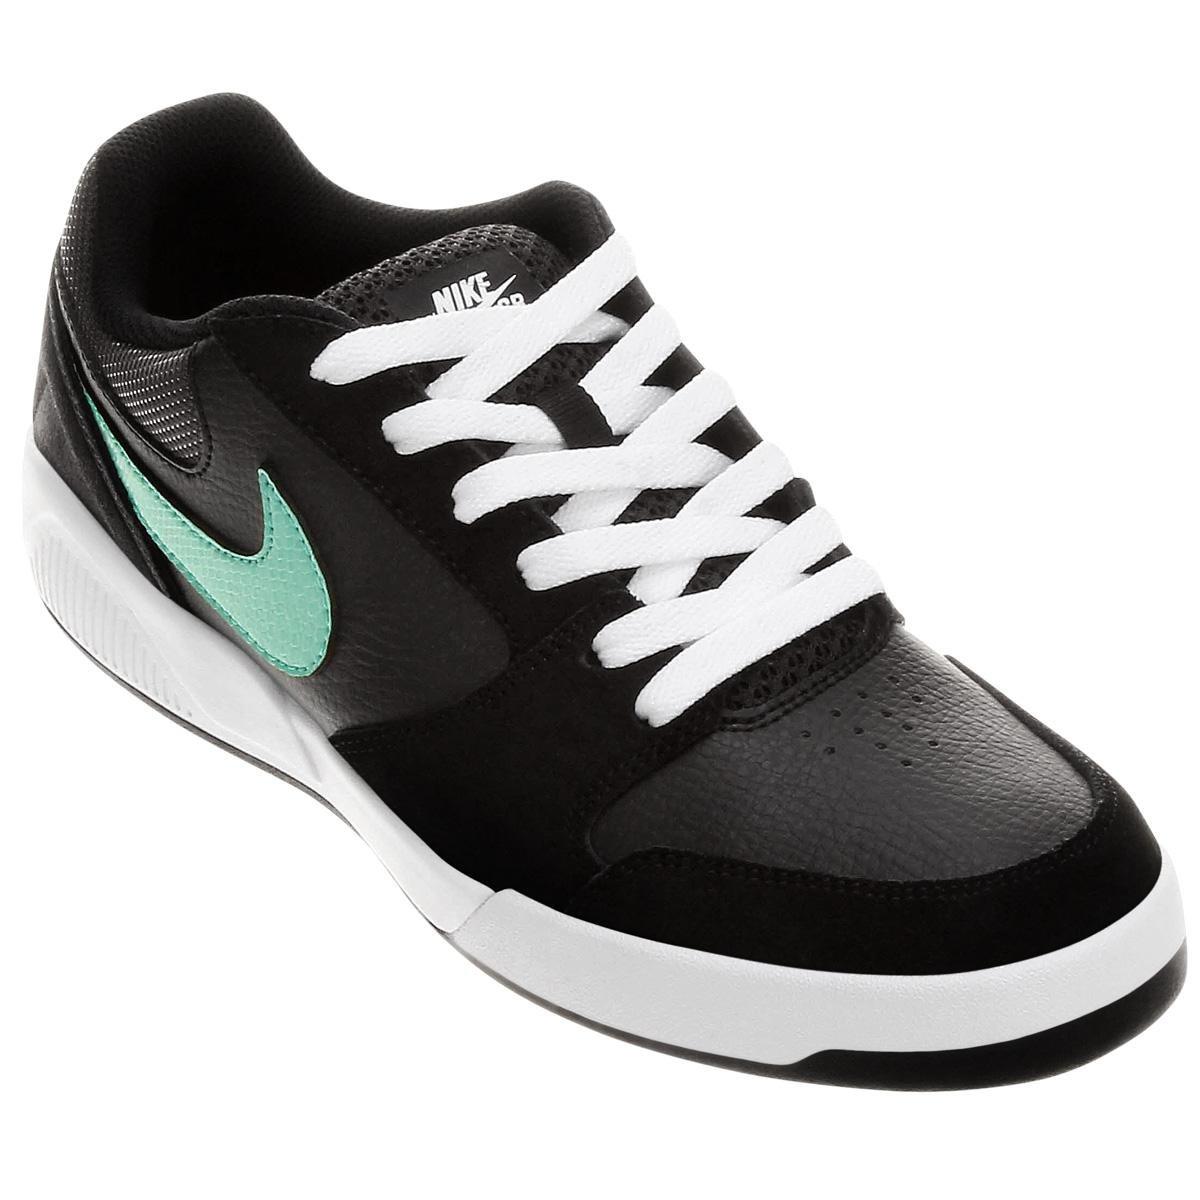 Tênis Nike Debazer SB - Compre Agora  2f987a48eb5bc